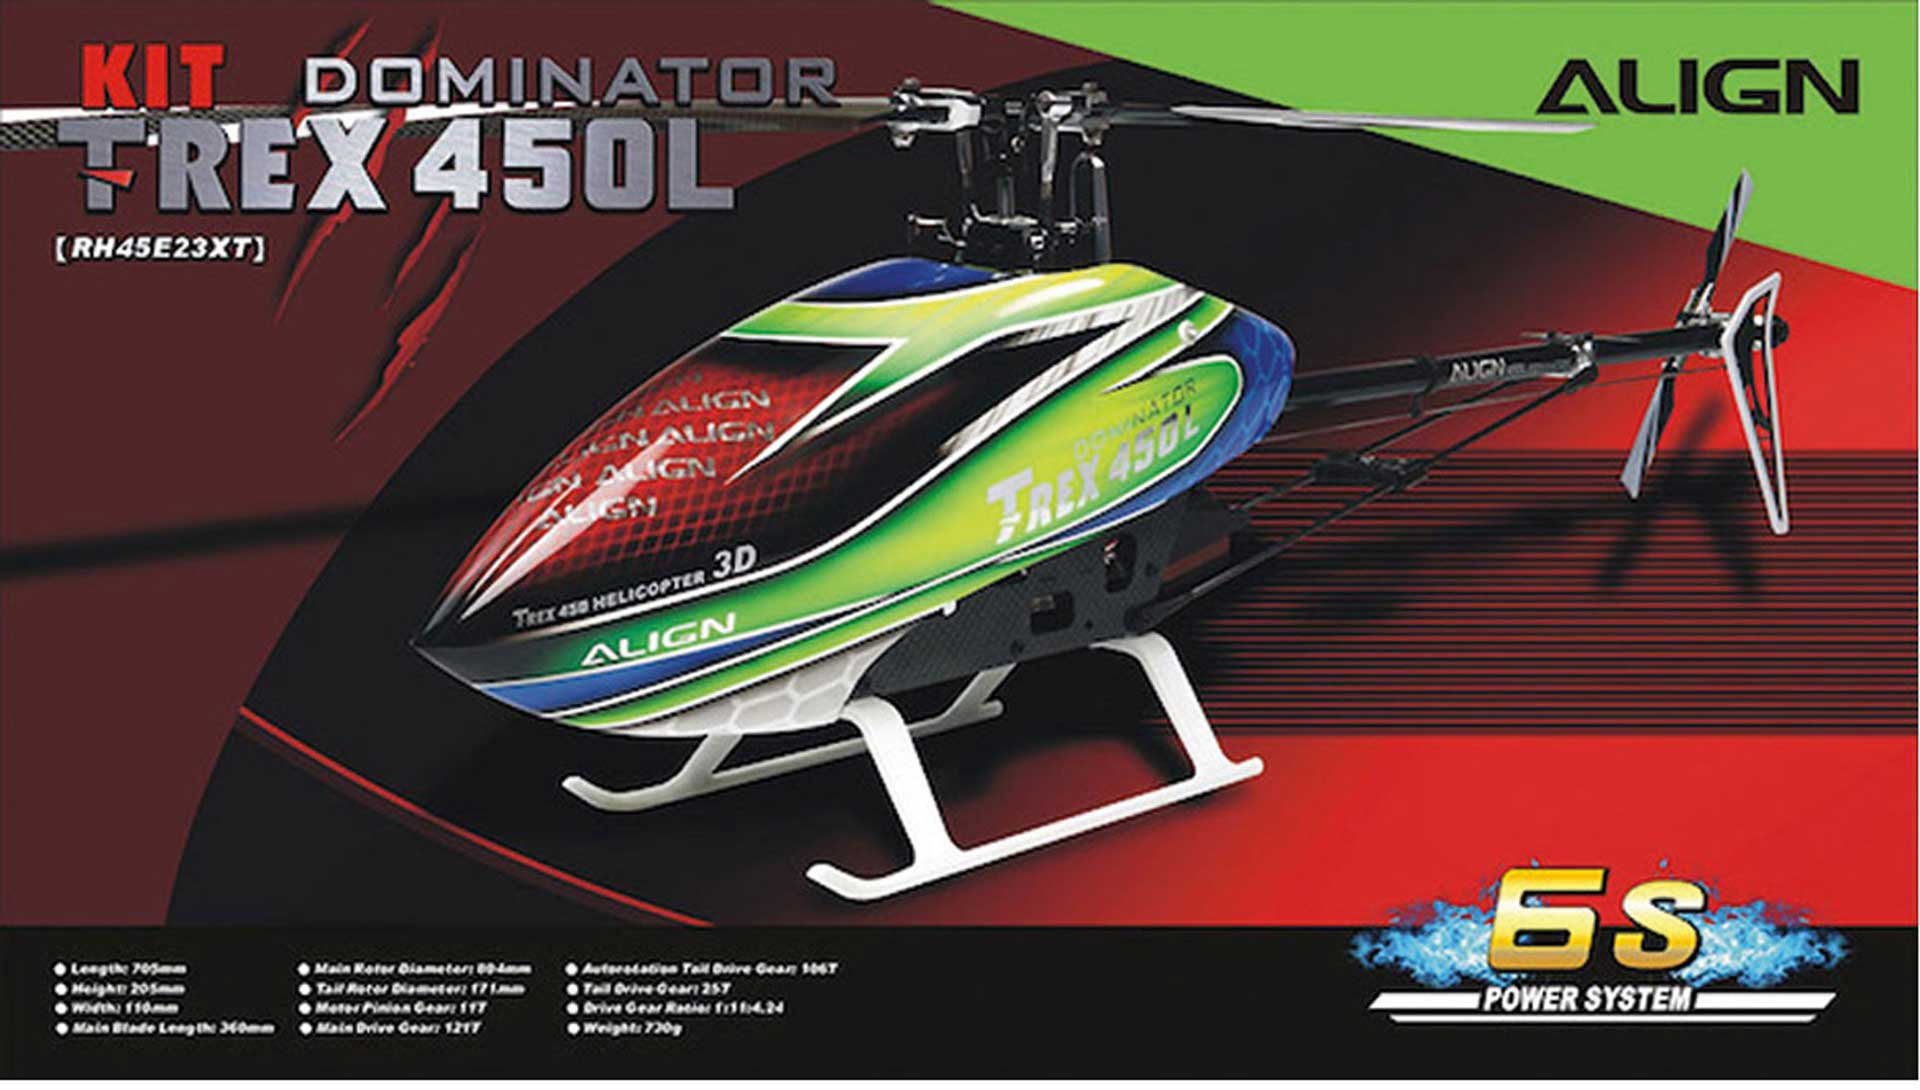 ALIGN T-REX 450L DOMINATOR KIT (6S) INKL. ANTRIEB Hubschrauber / Helikopter